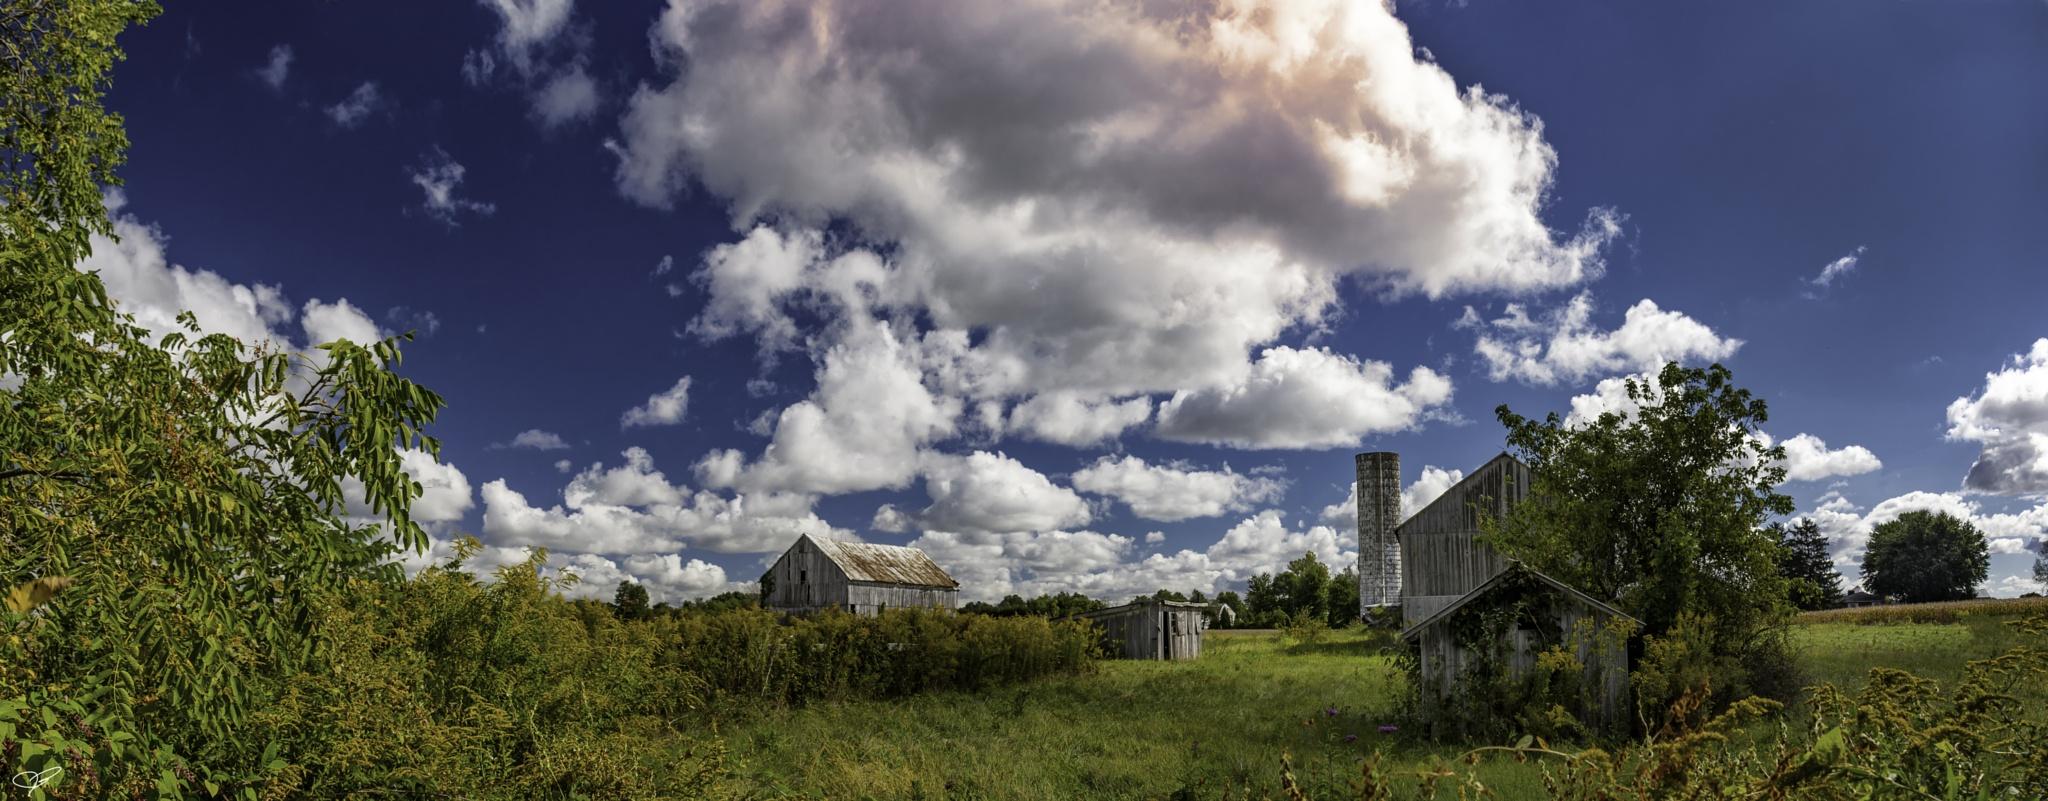 farmland by JohnBrake